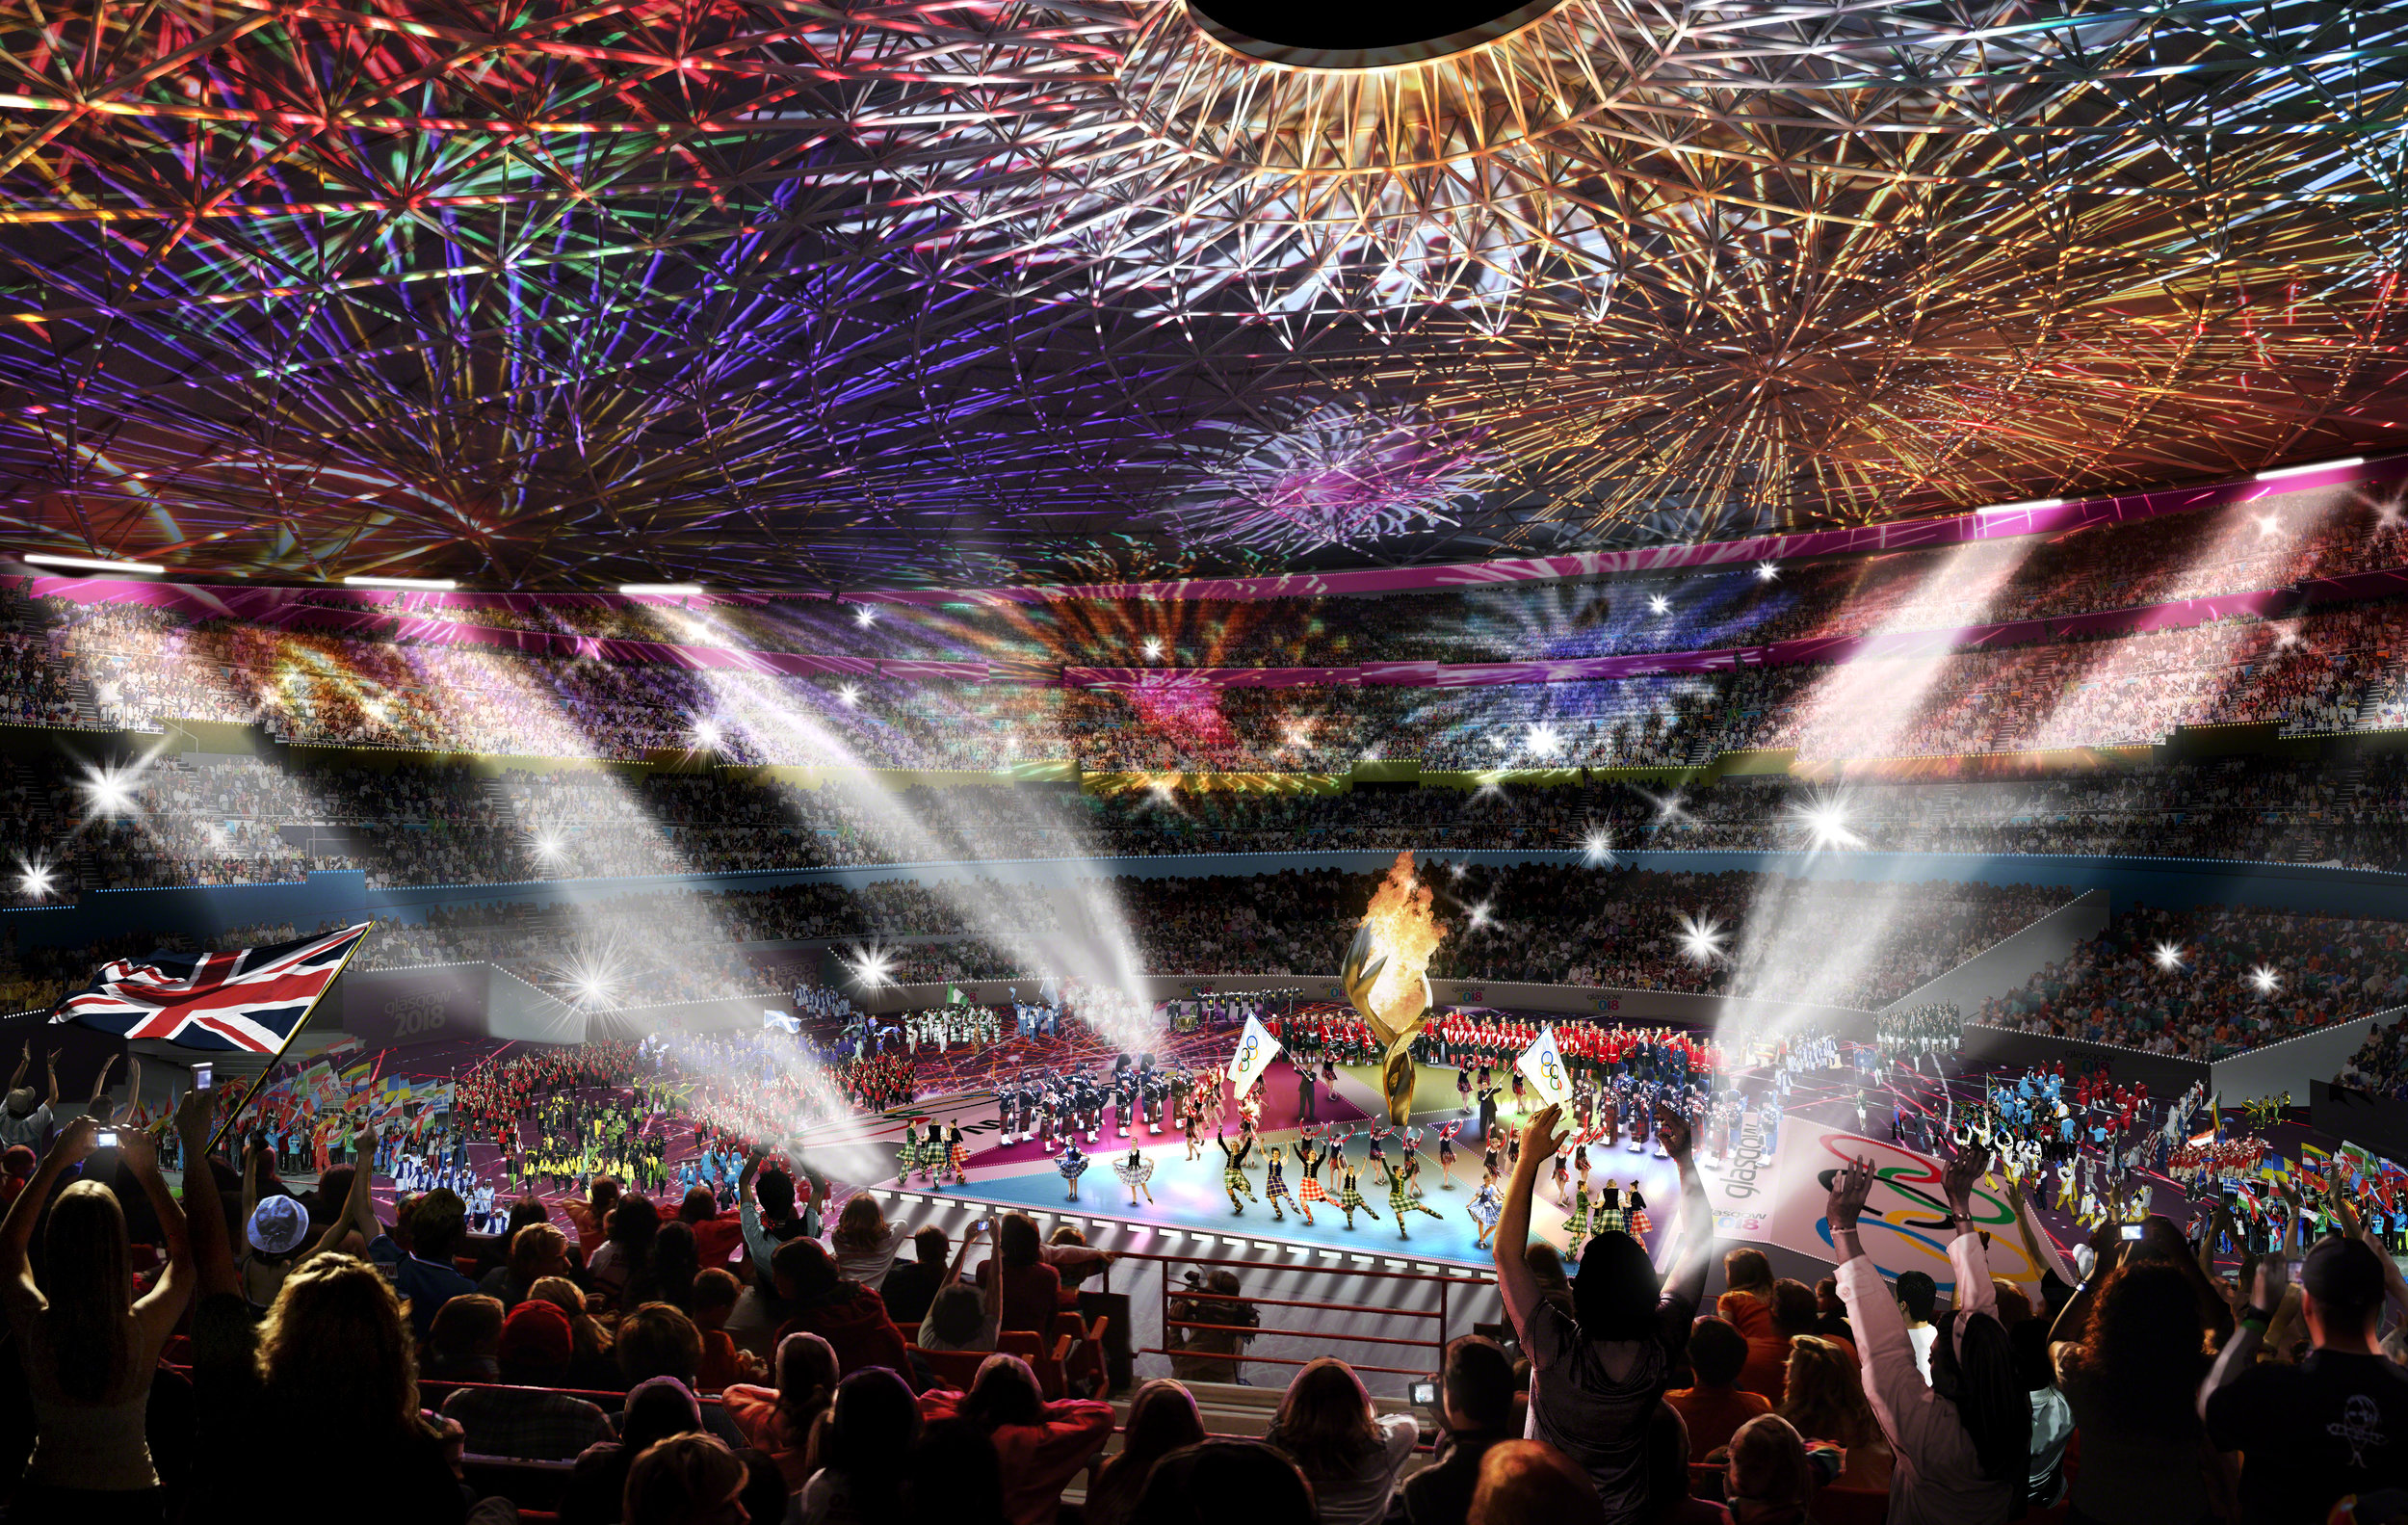 Glasgow 2018 Youth Olympics (2113 2113_OpeningCeremony_FINAL).jpg